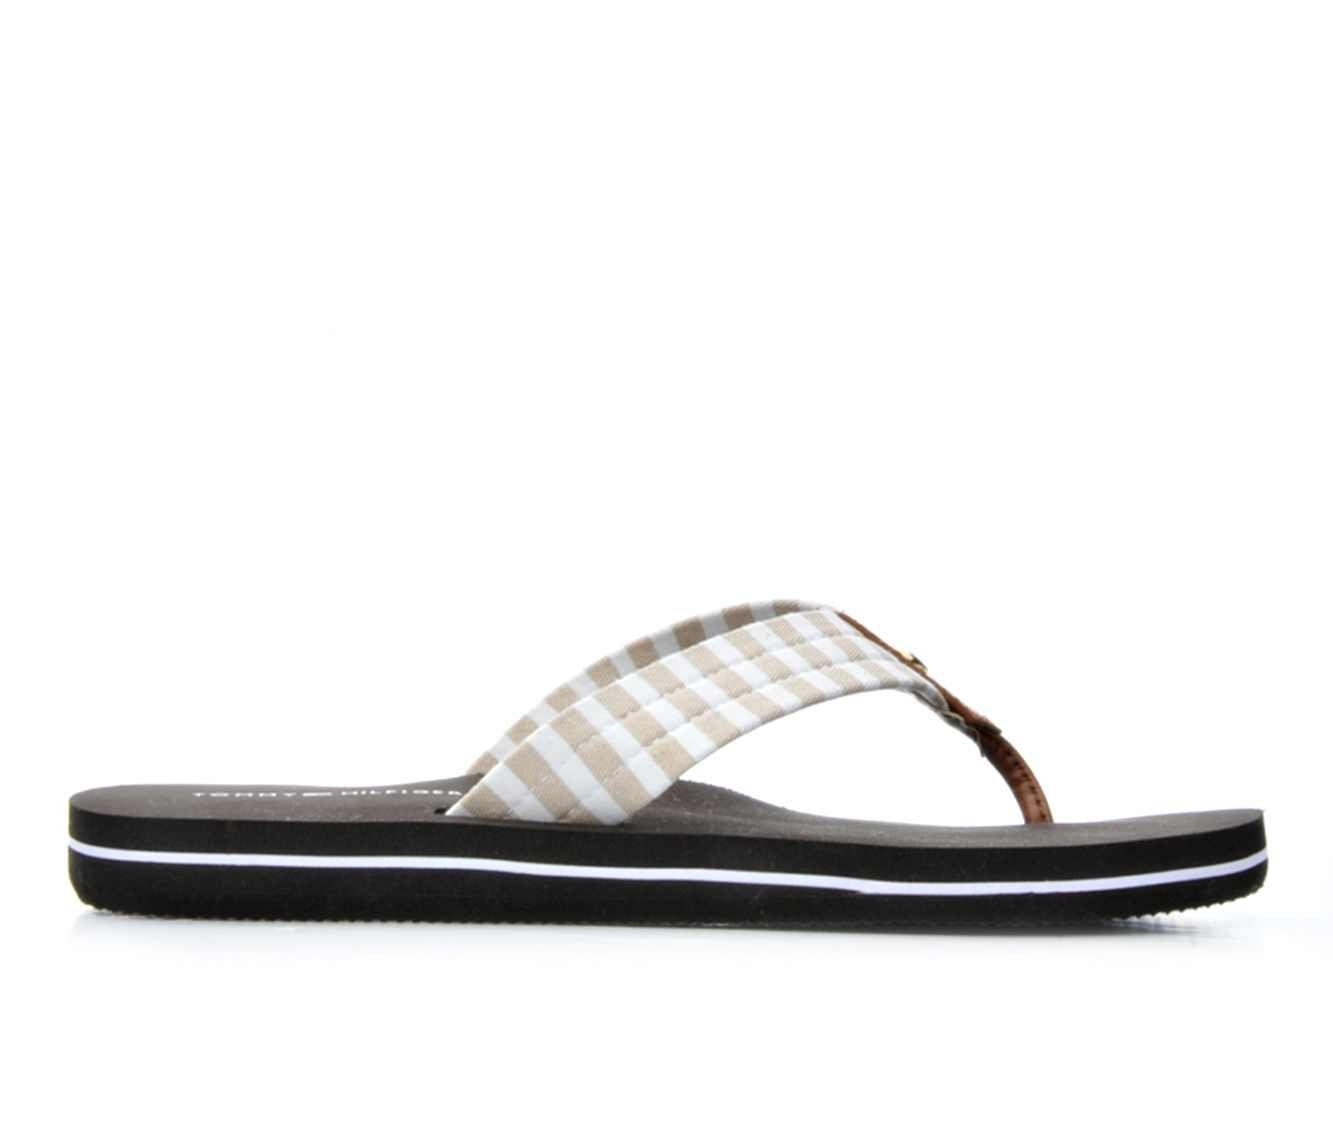 nicekicks online cheap amazon Women's Tommy Hilfiger Cicin Flip-Flops cheap sale in China discount clearance recommend 7FpSz6